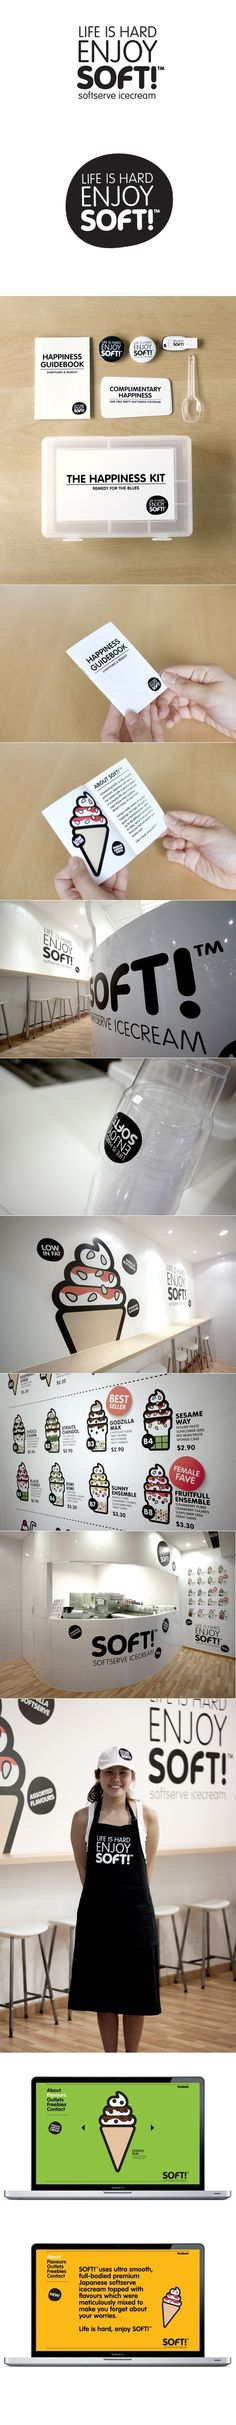 Design / SoftTM branding by Bravo Company